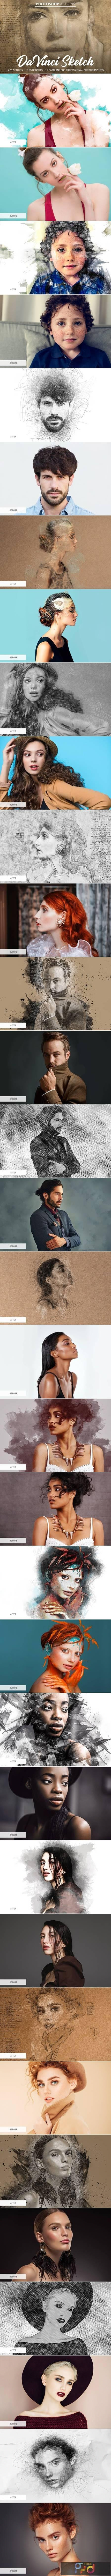 Da Vinci Sketch Action for Photoshop 4847888 1